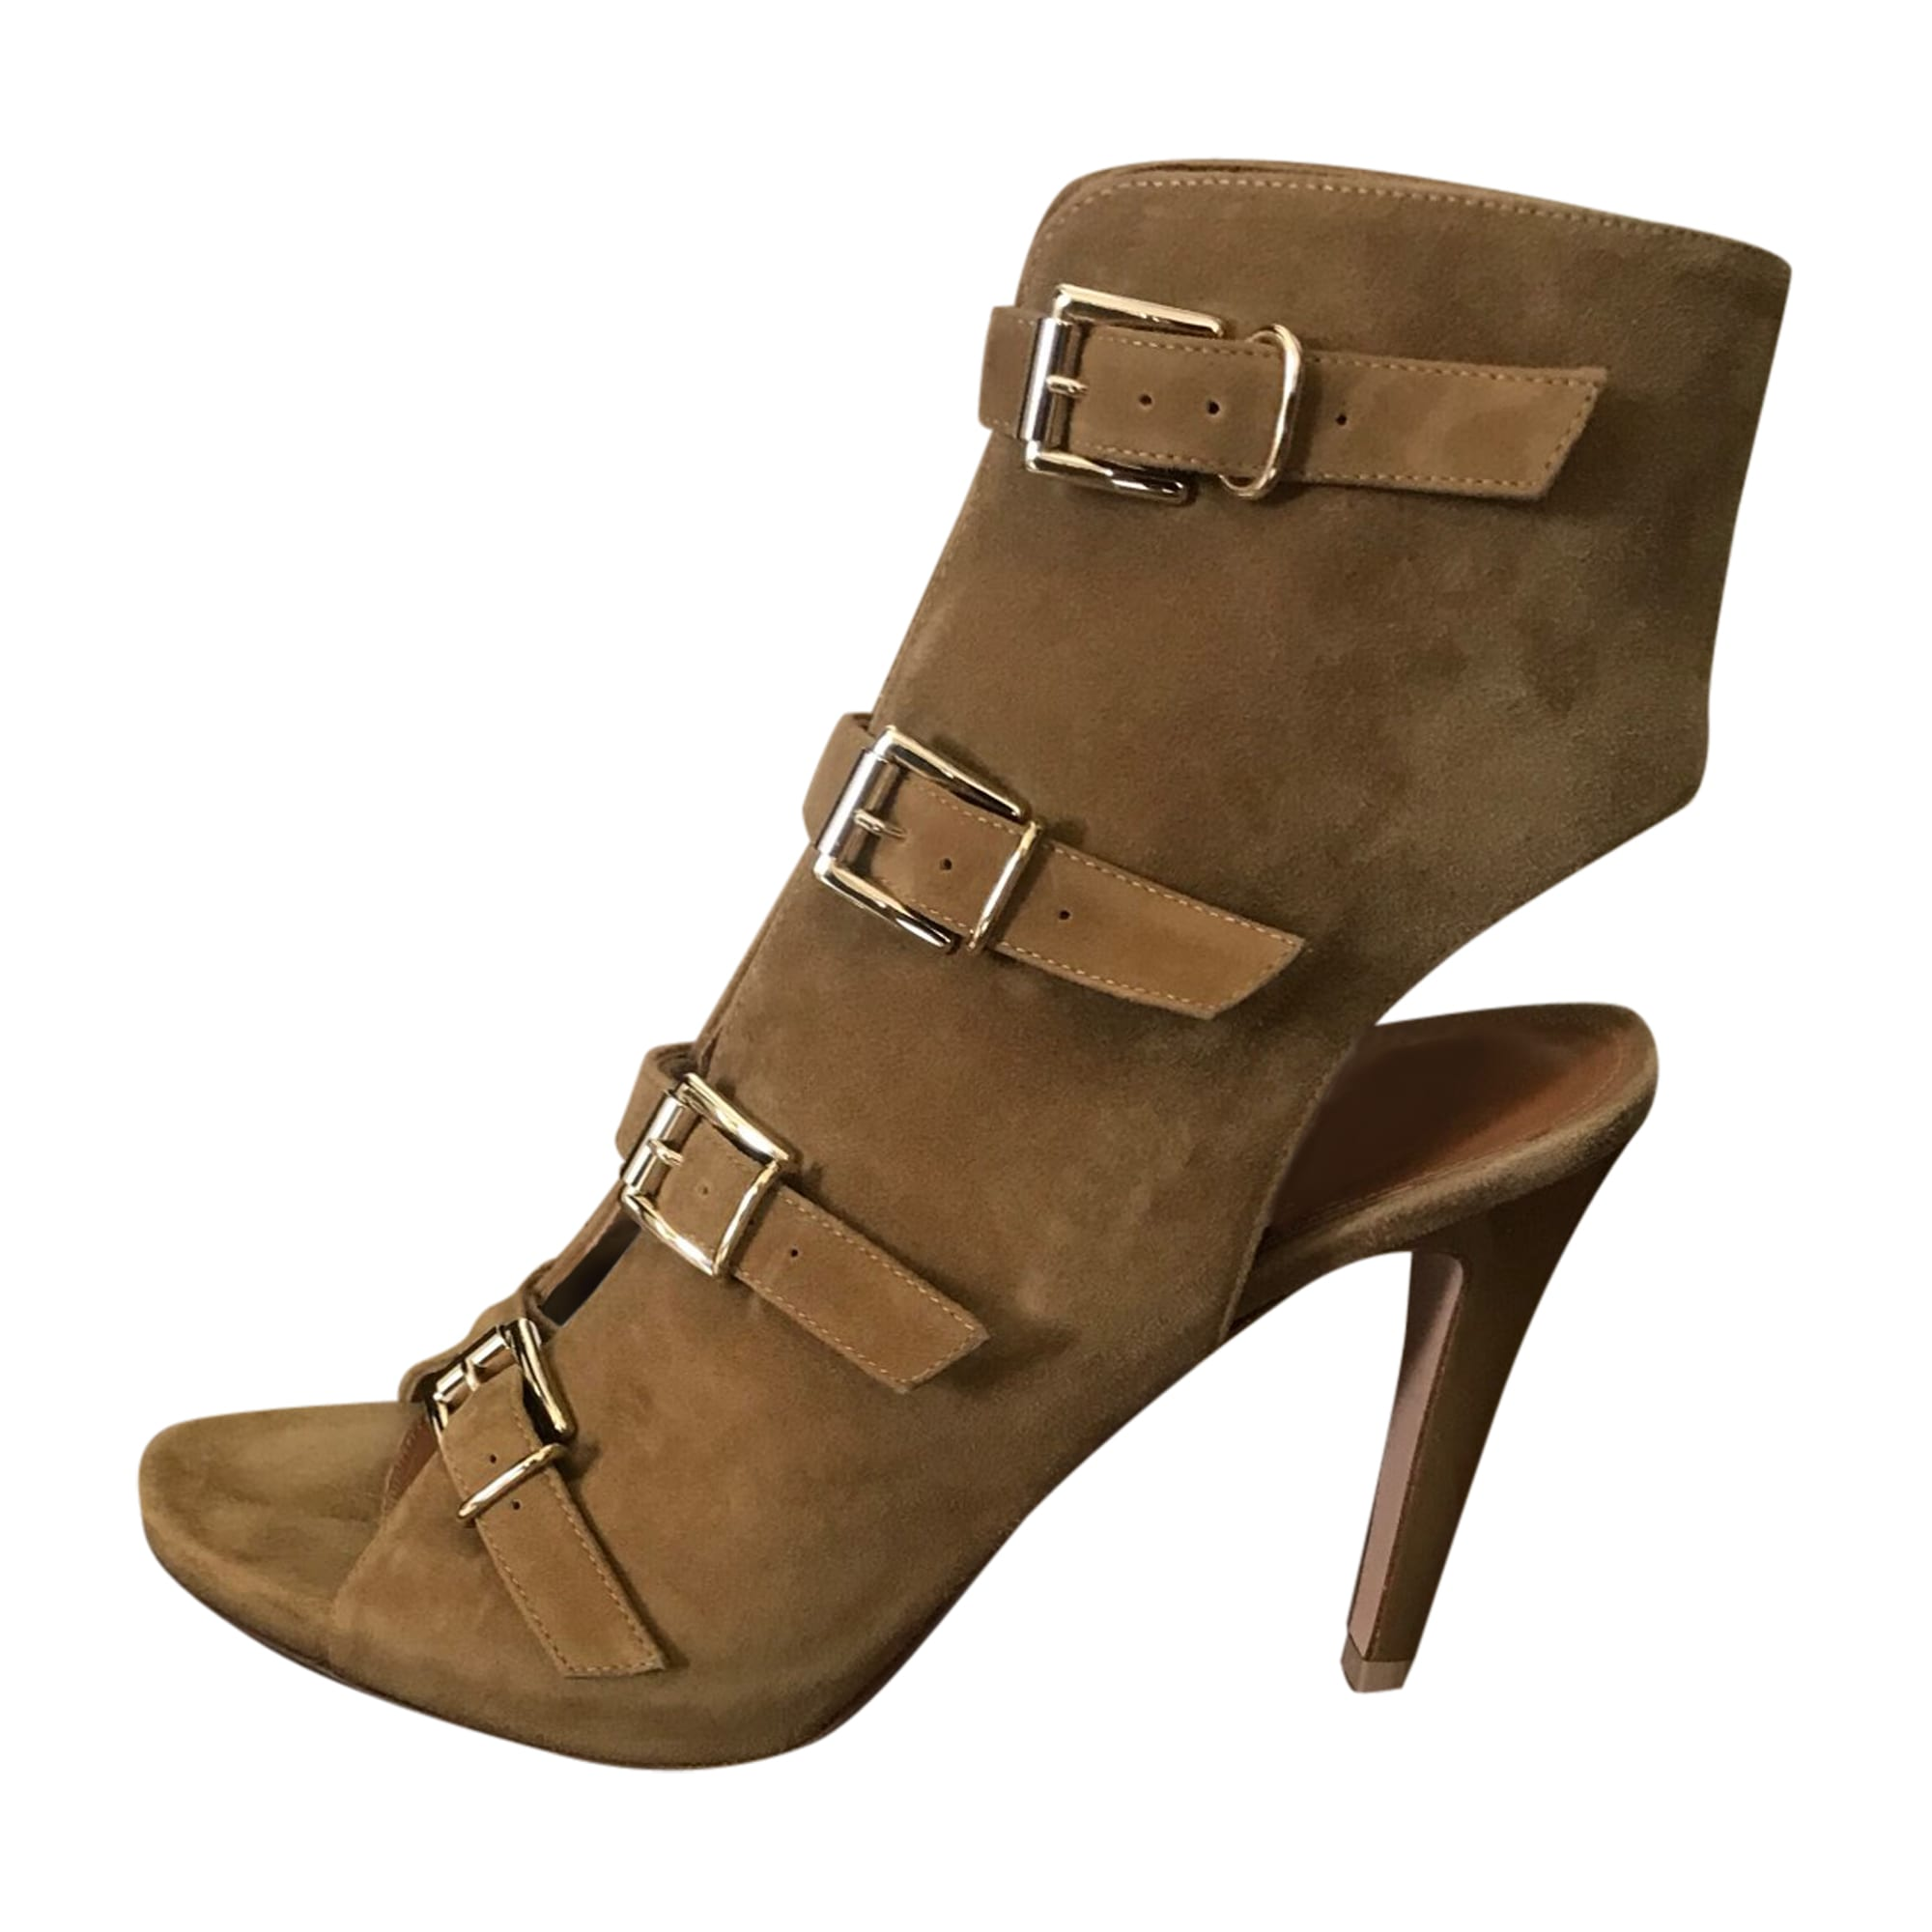 Sandales à talons GIANVITO ROSSI Beige, camel